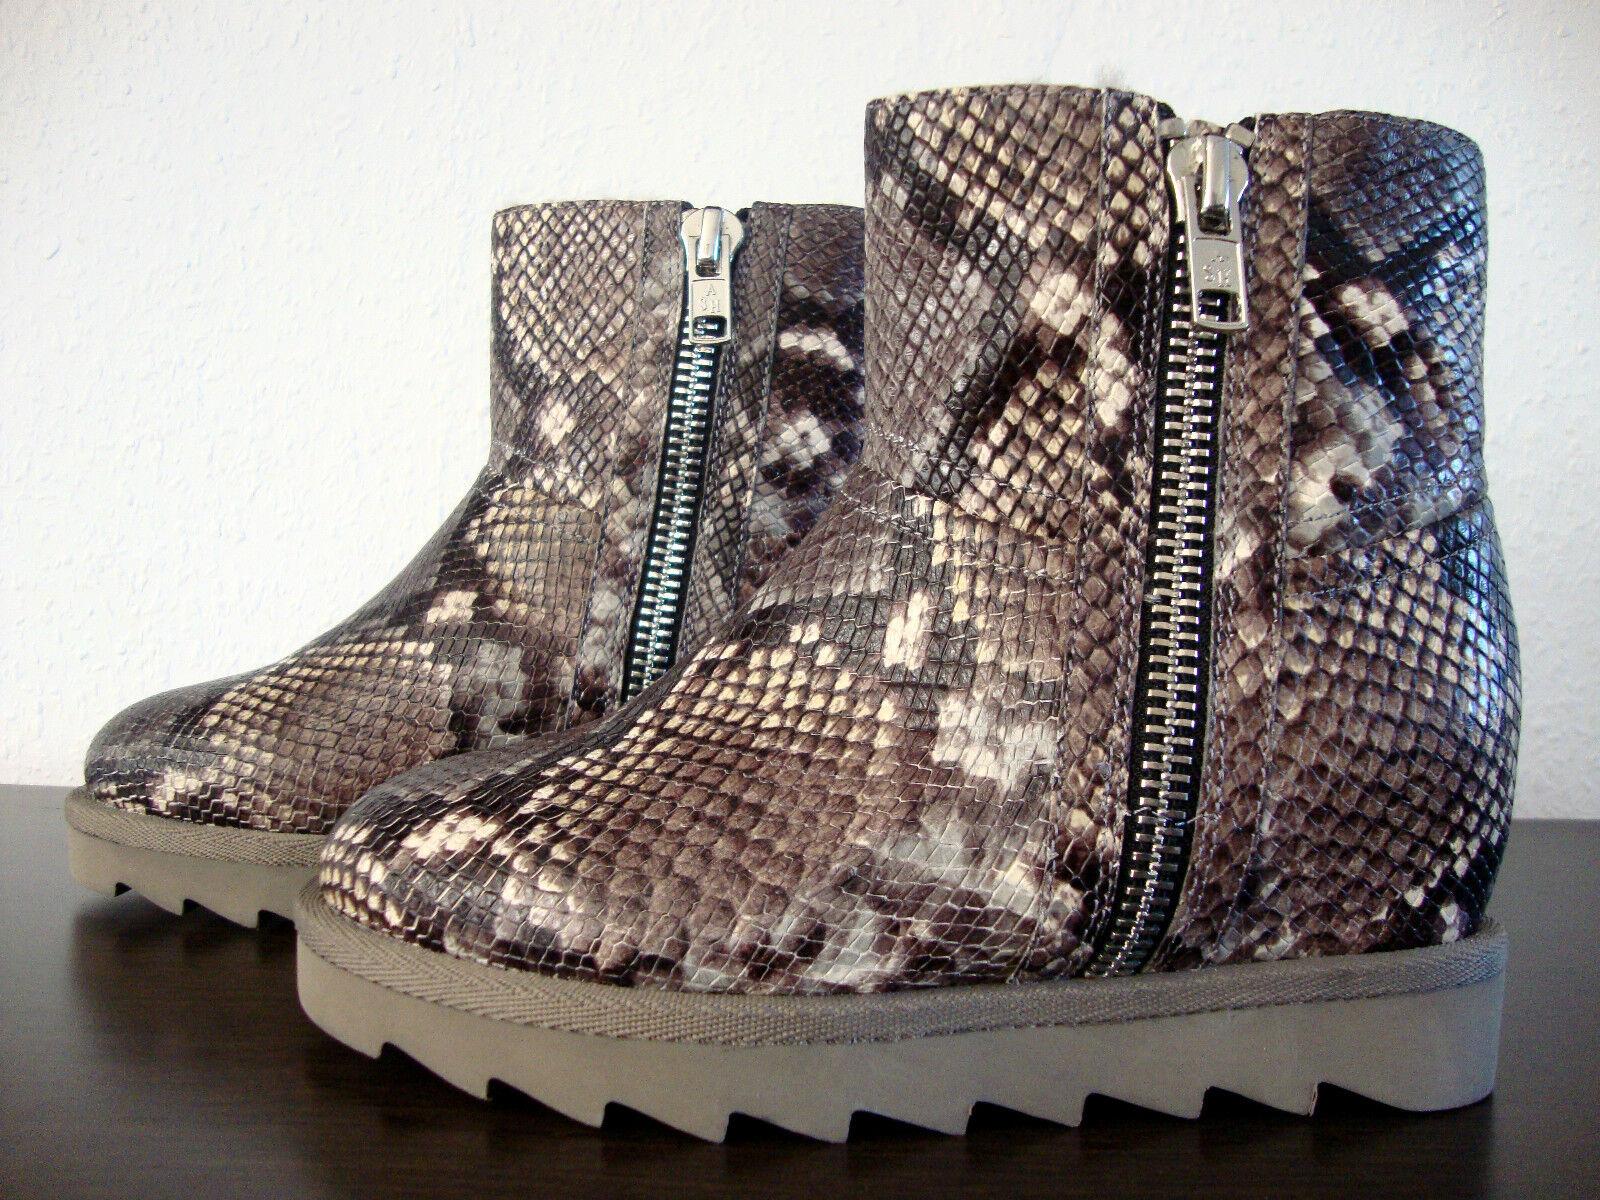 ASH YANG BIS Wedge Boots Damen Stiefelette Stiefel Leder Schuhe Pyhton Gr.37 NEU